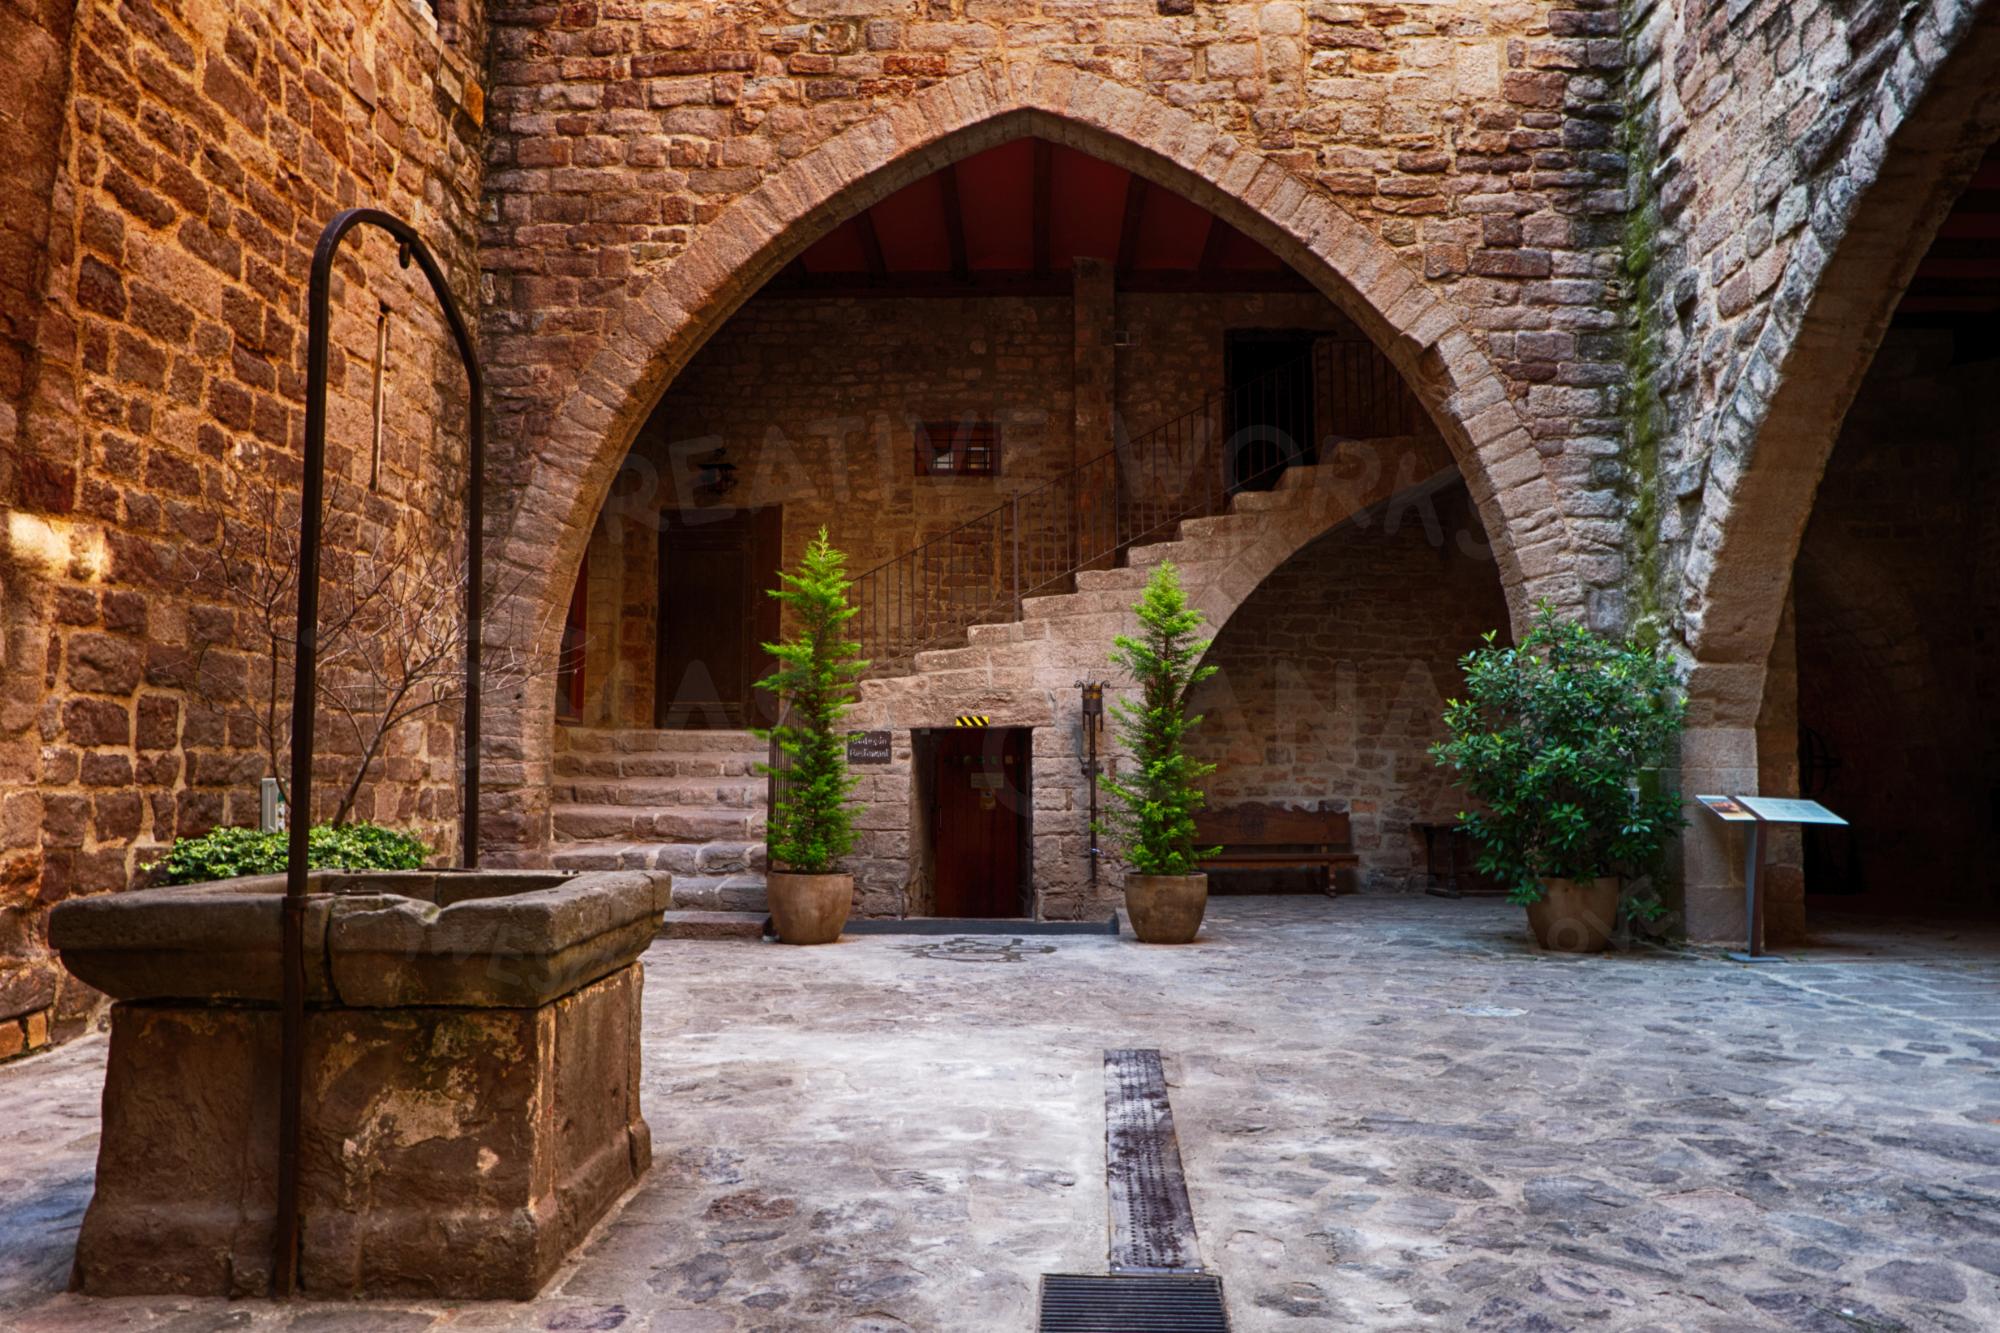 Inner Courtyard Of Cardona Castle 5 - Photo example image 1